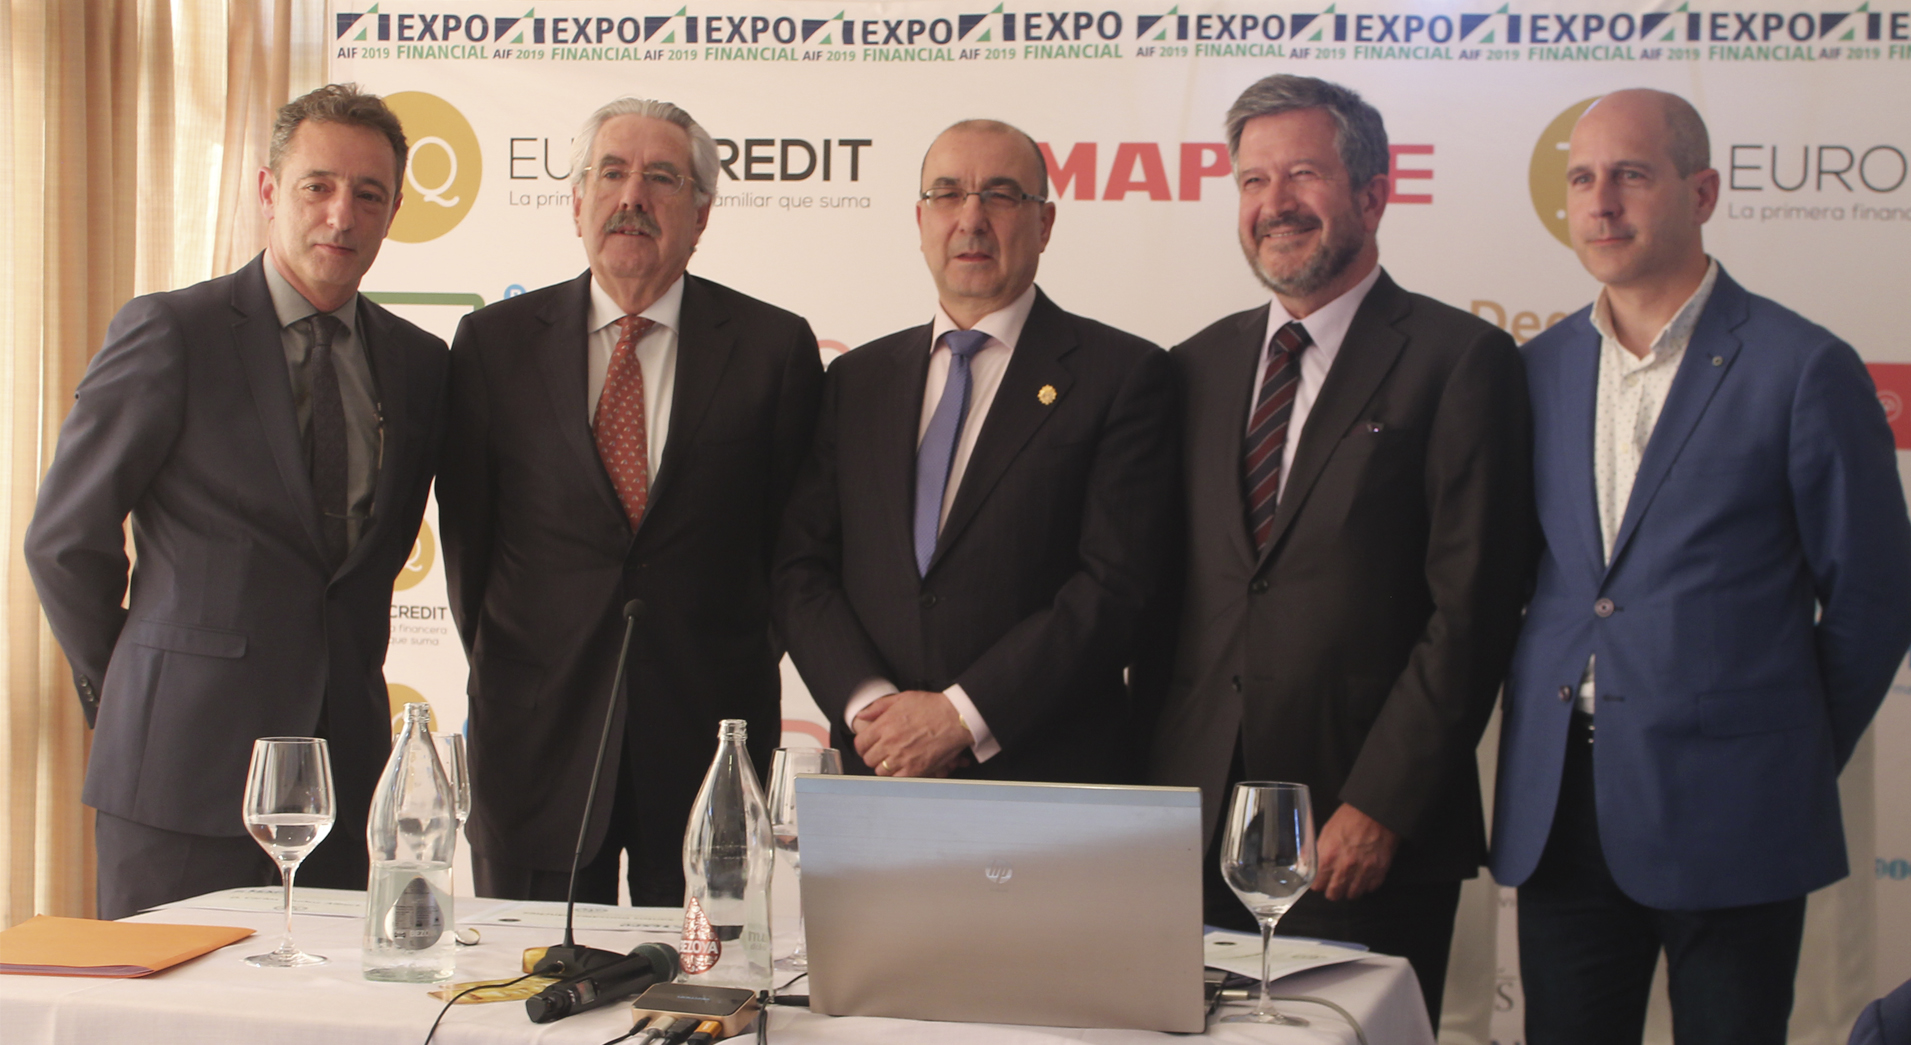 Ponentes Expofinancial 2019 ley hipotecaria Lagunas de la Ley Hipotecaria en la Jornada Expofinancial 2019